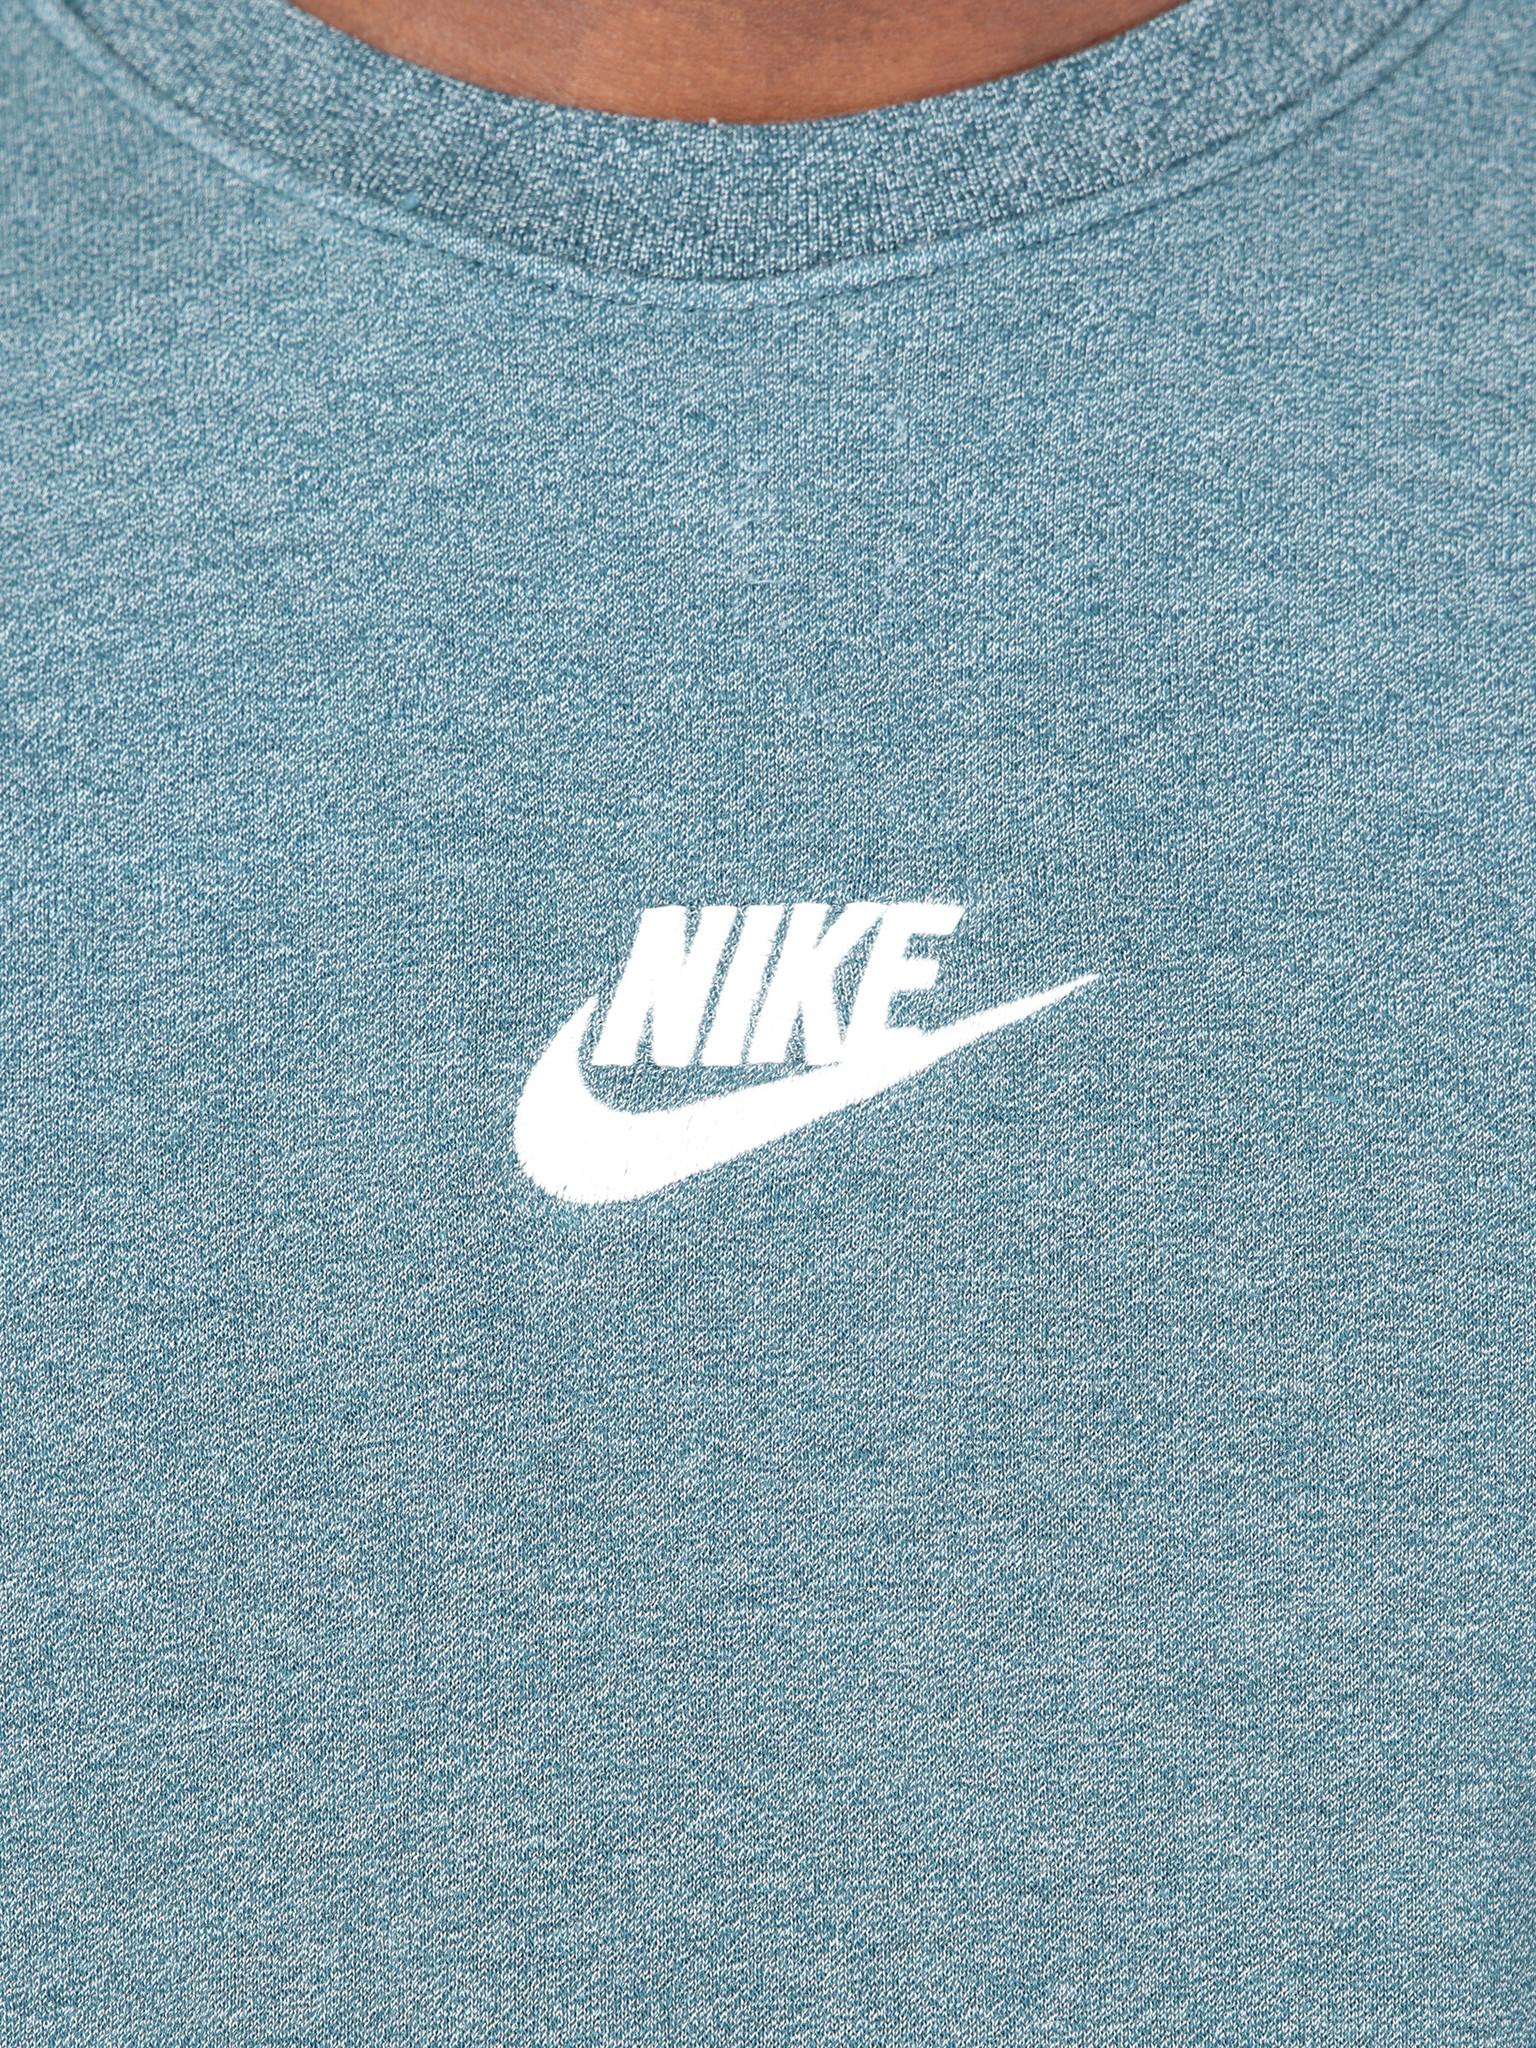 Nike Nike Sportswear Heritage Nightshade Htr Sail 928427-304